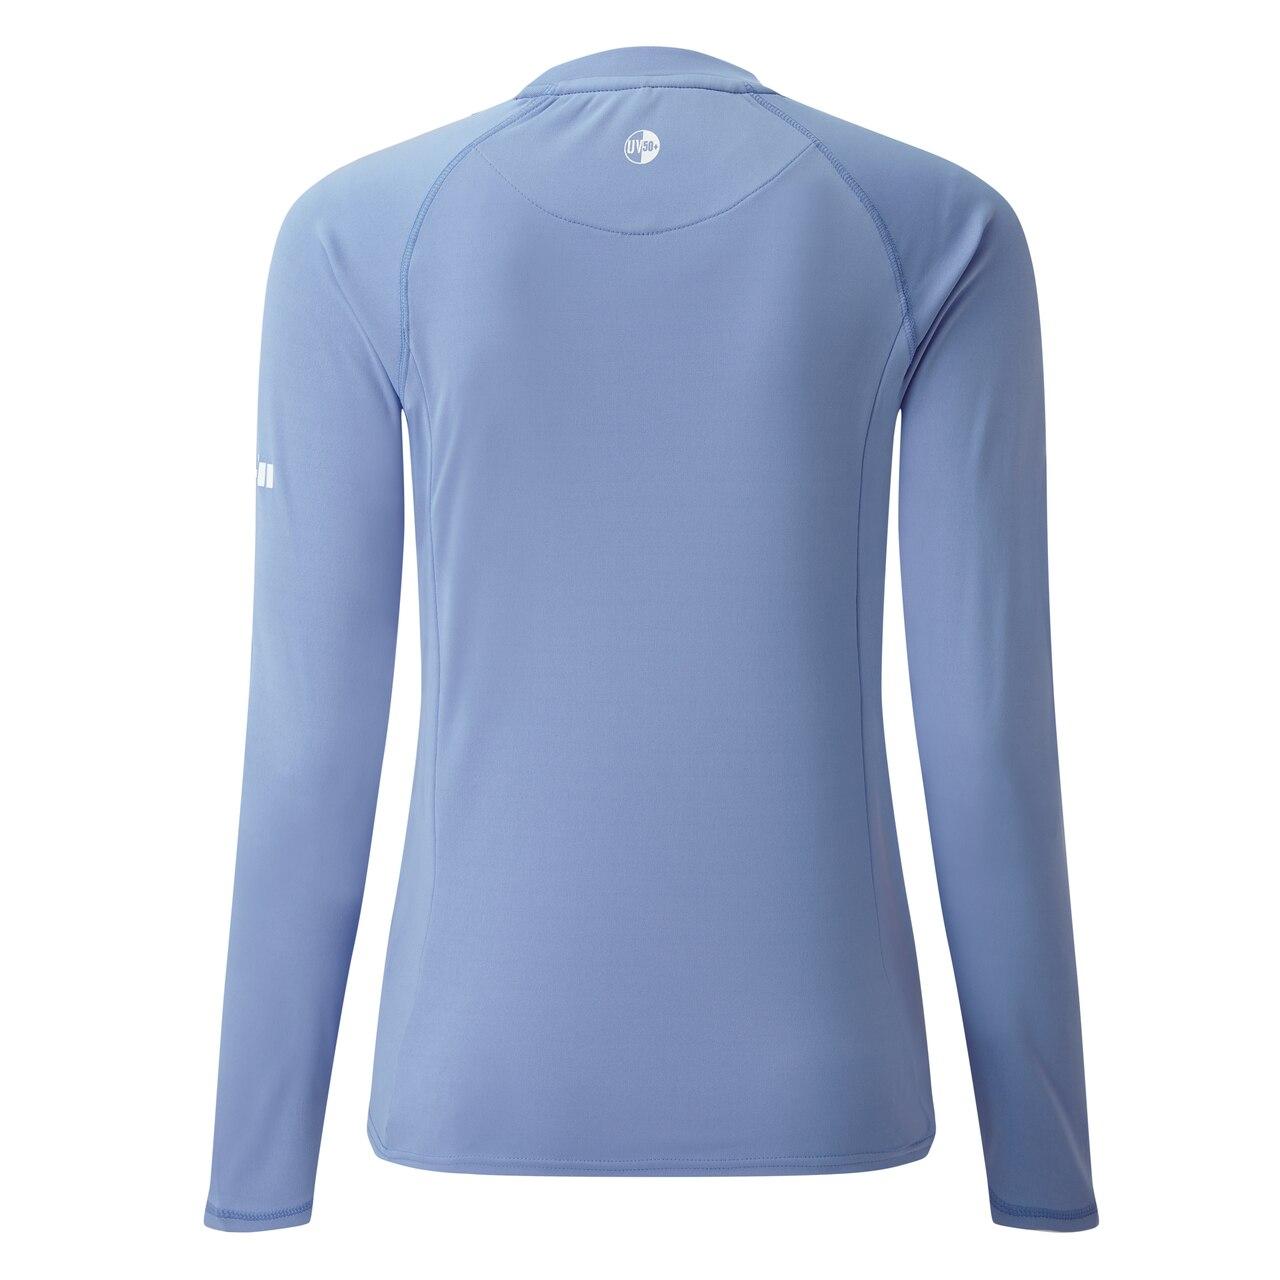 Women's UV Tec Long Sleeve Tee - UV011W-BLU18-3.jpg